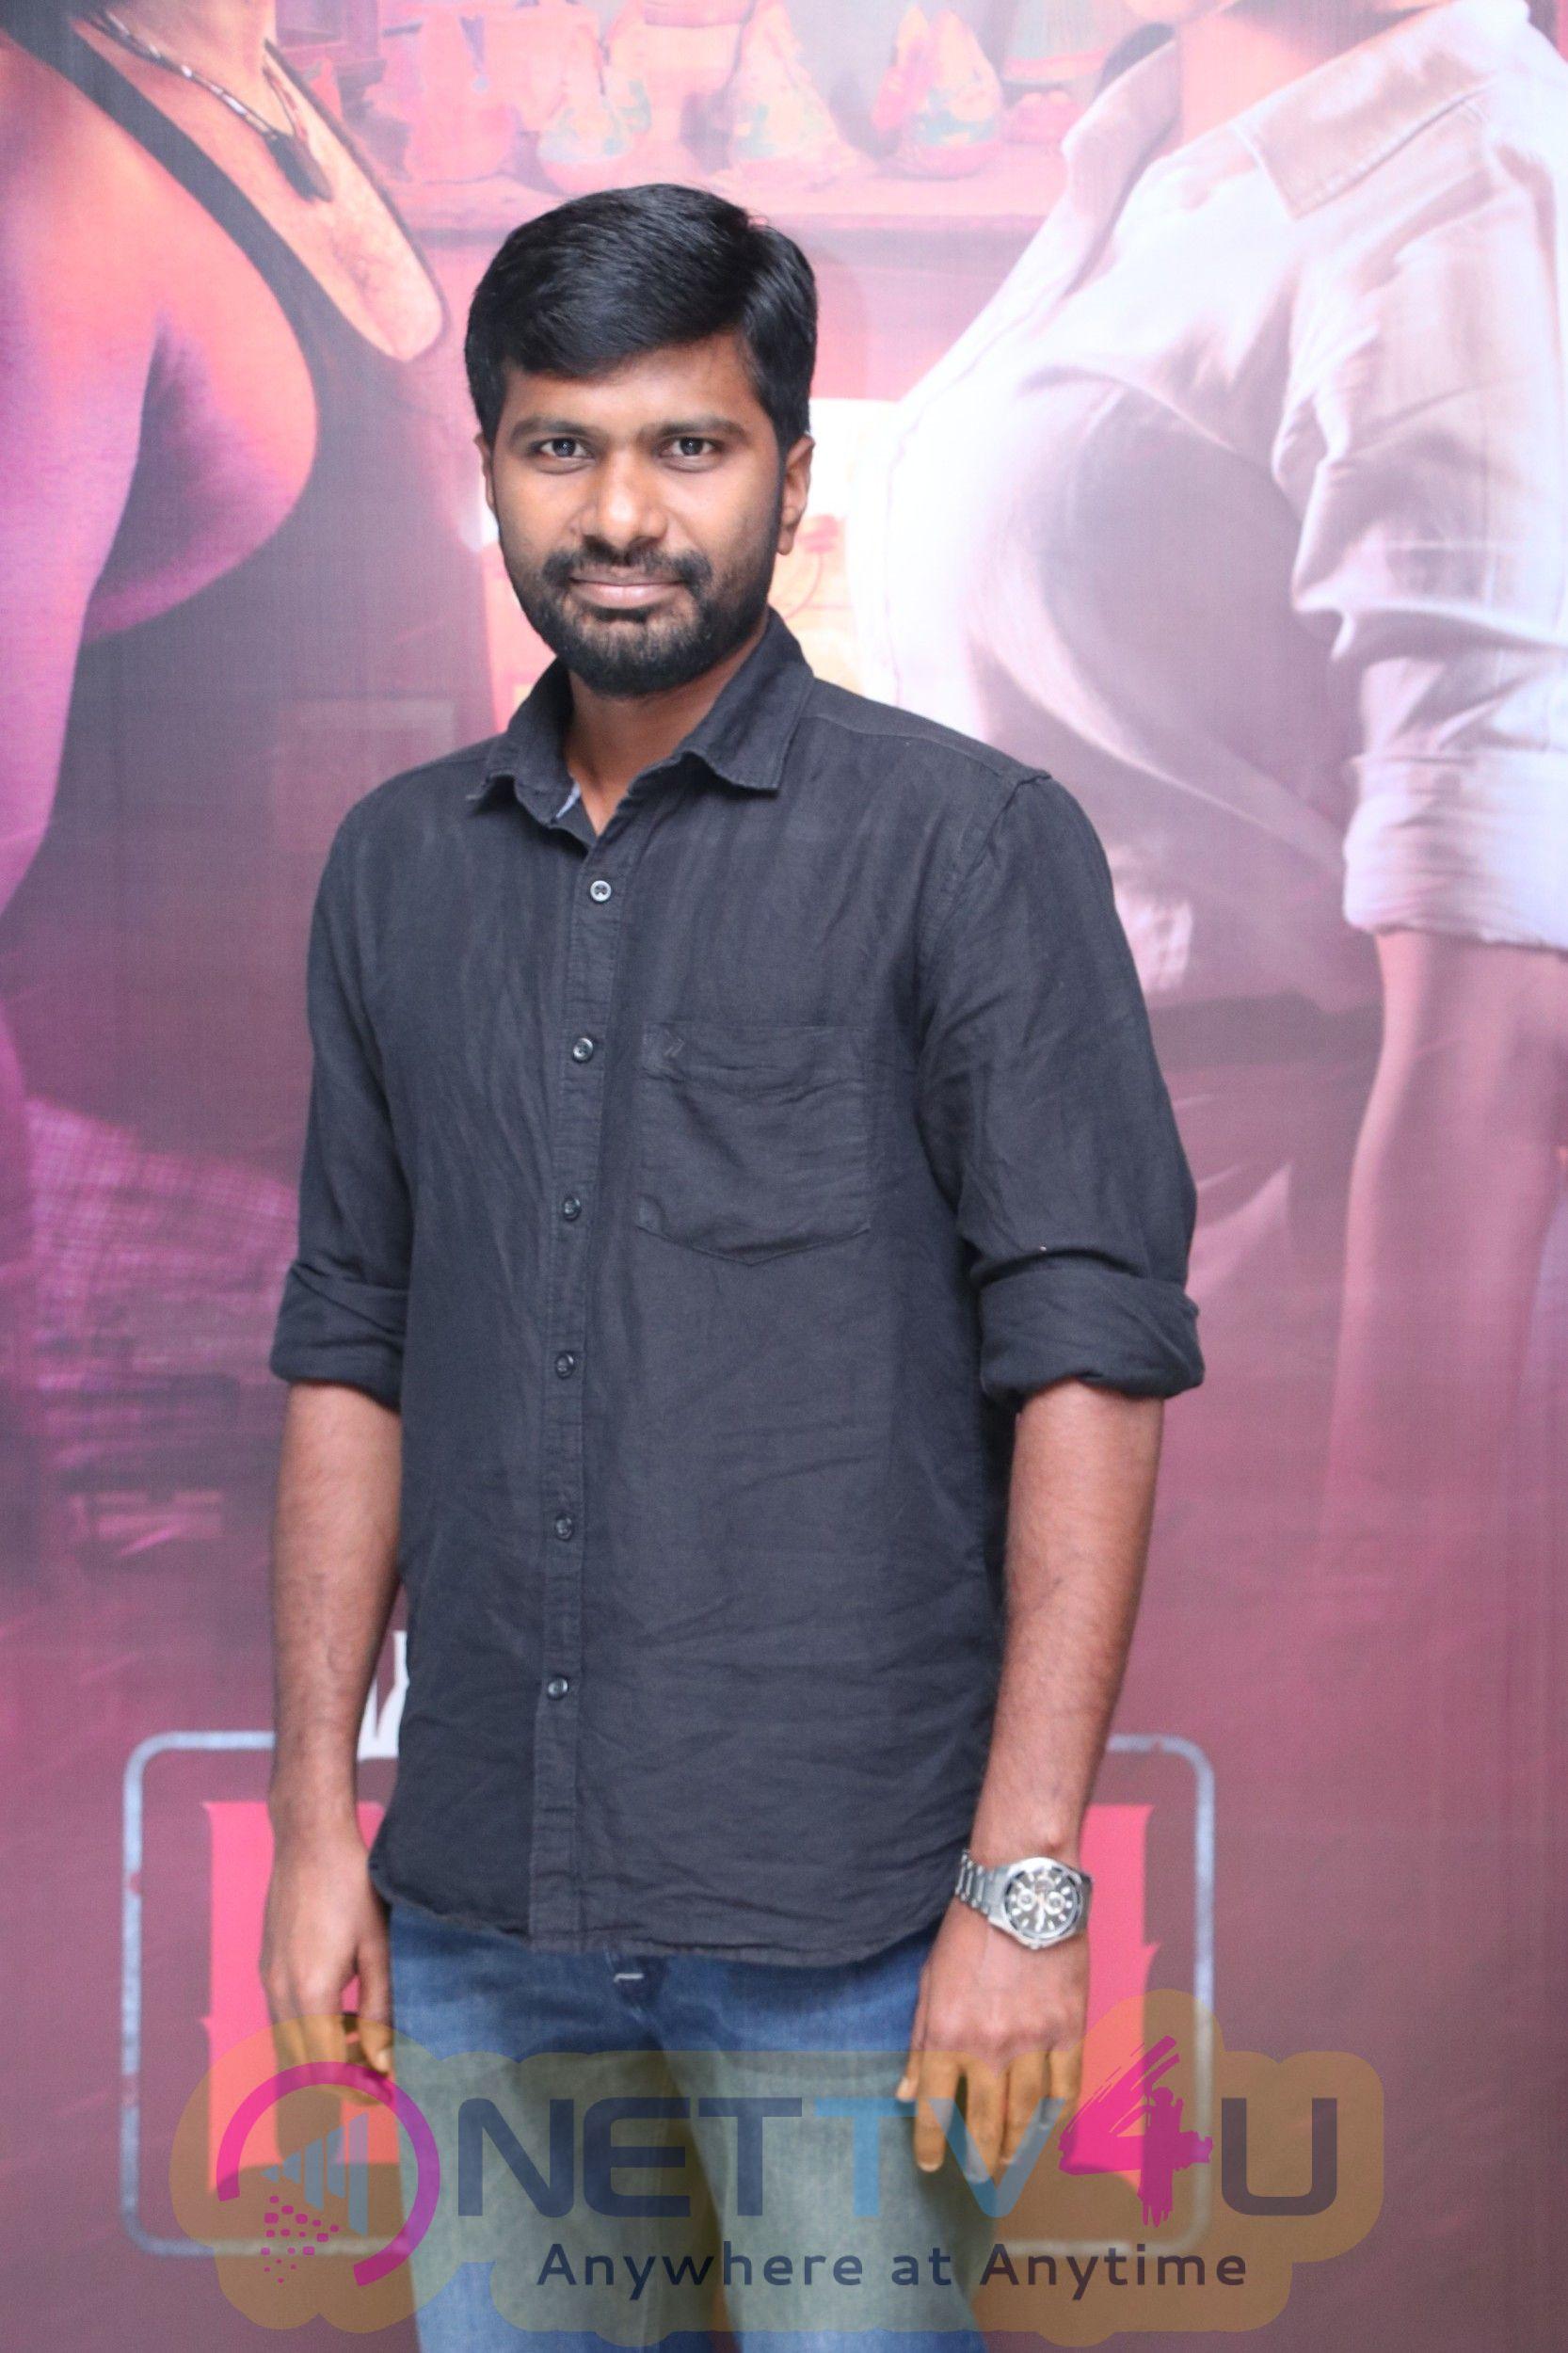 Vella Raja Amazon First Prime Exclusive Series Press Meet Pic Tamil Gallery